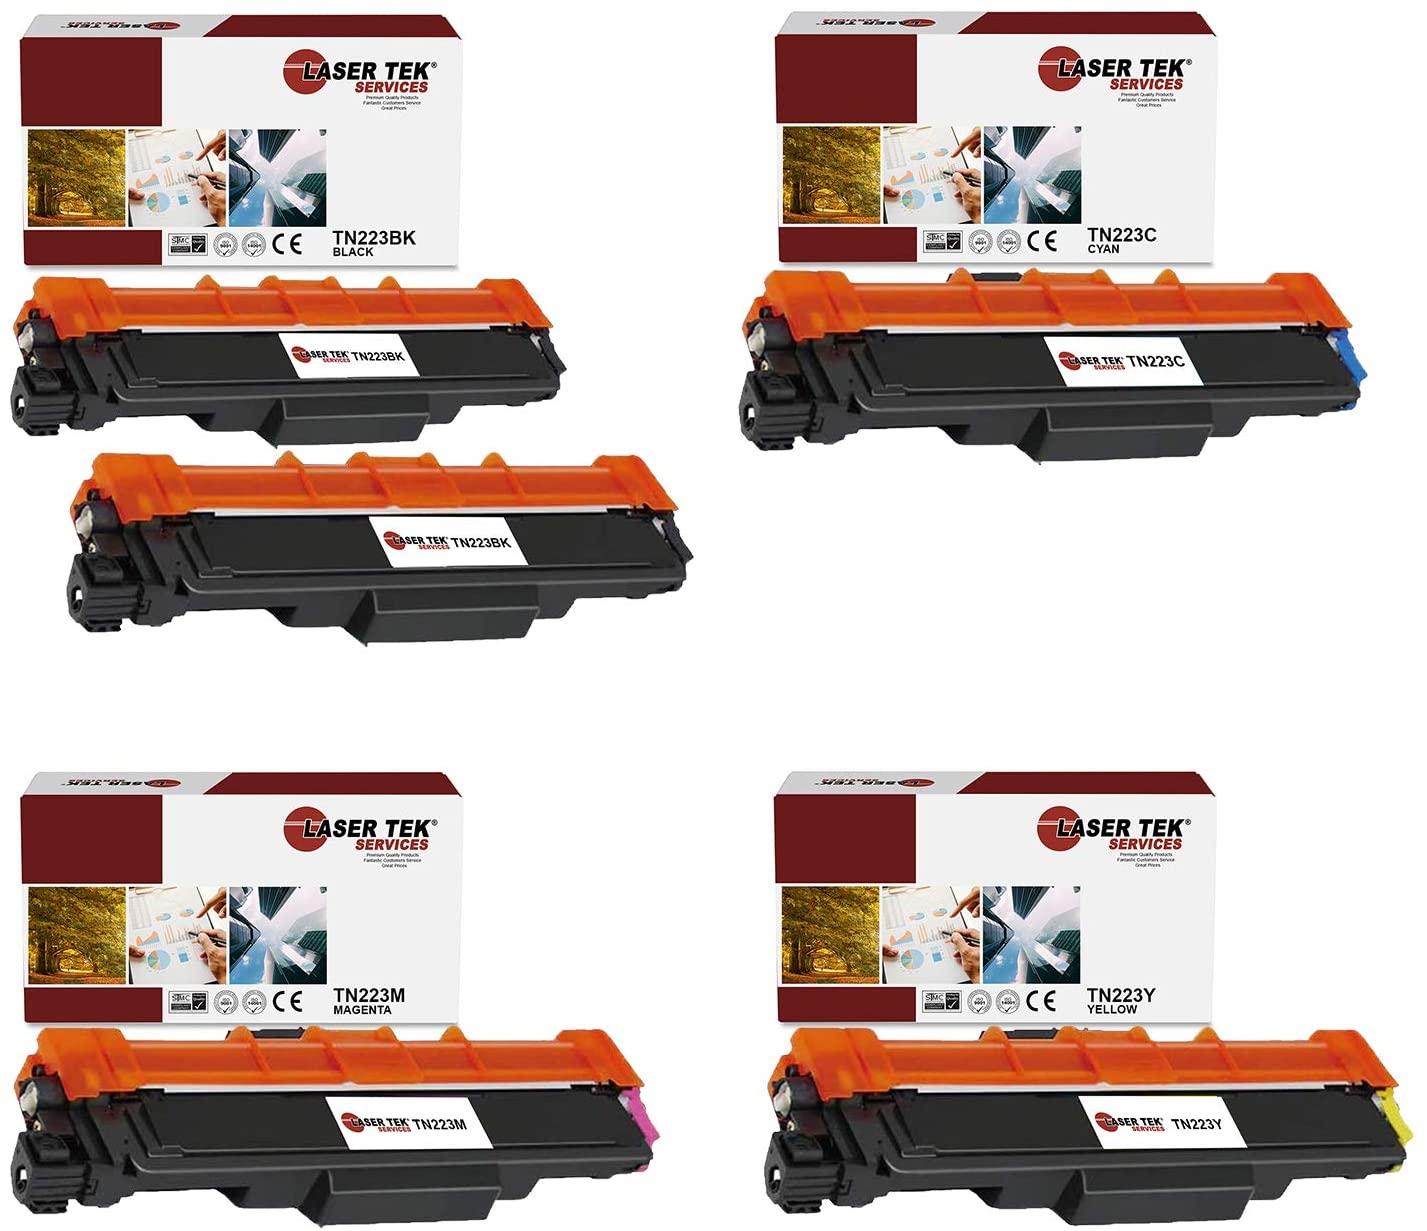 Laser Tek Services Compatible TN-223 TN223BK TN223C TN223M TN223Y Toner Cartridge Replacement for Brother HLL3210CW L3230CDW, DCPL3510CDW Printers (Black, Cyan, Magenta, Yellow,5 Pack)